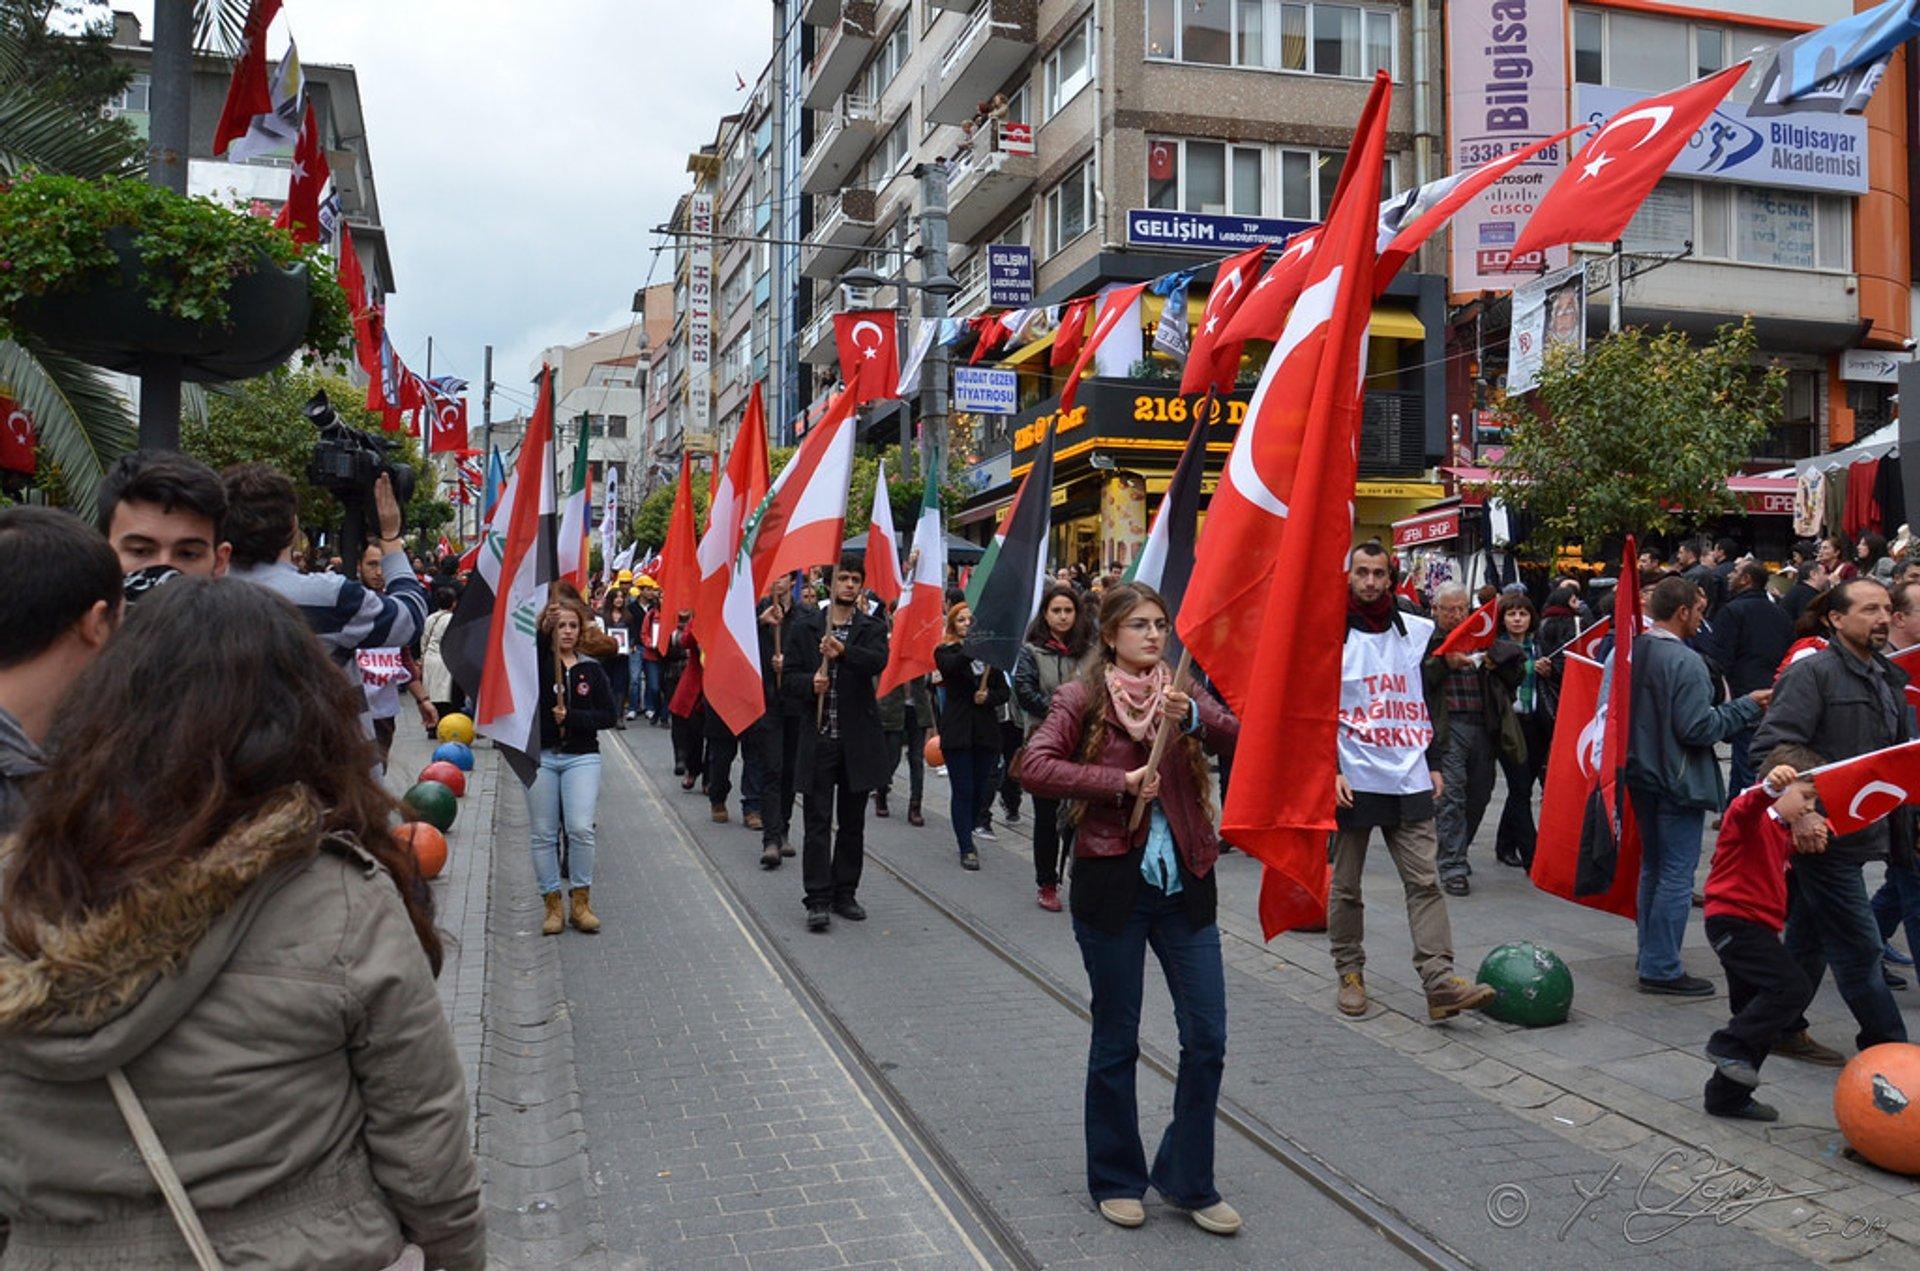 Cumhuriyet Bayramı or Republic Day in Istanbul 2020 - Best Time